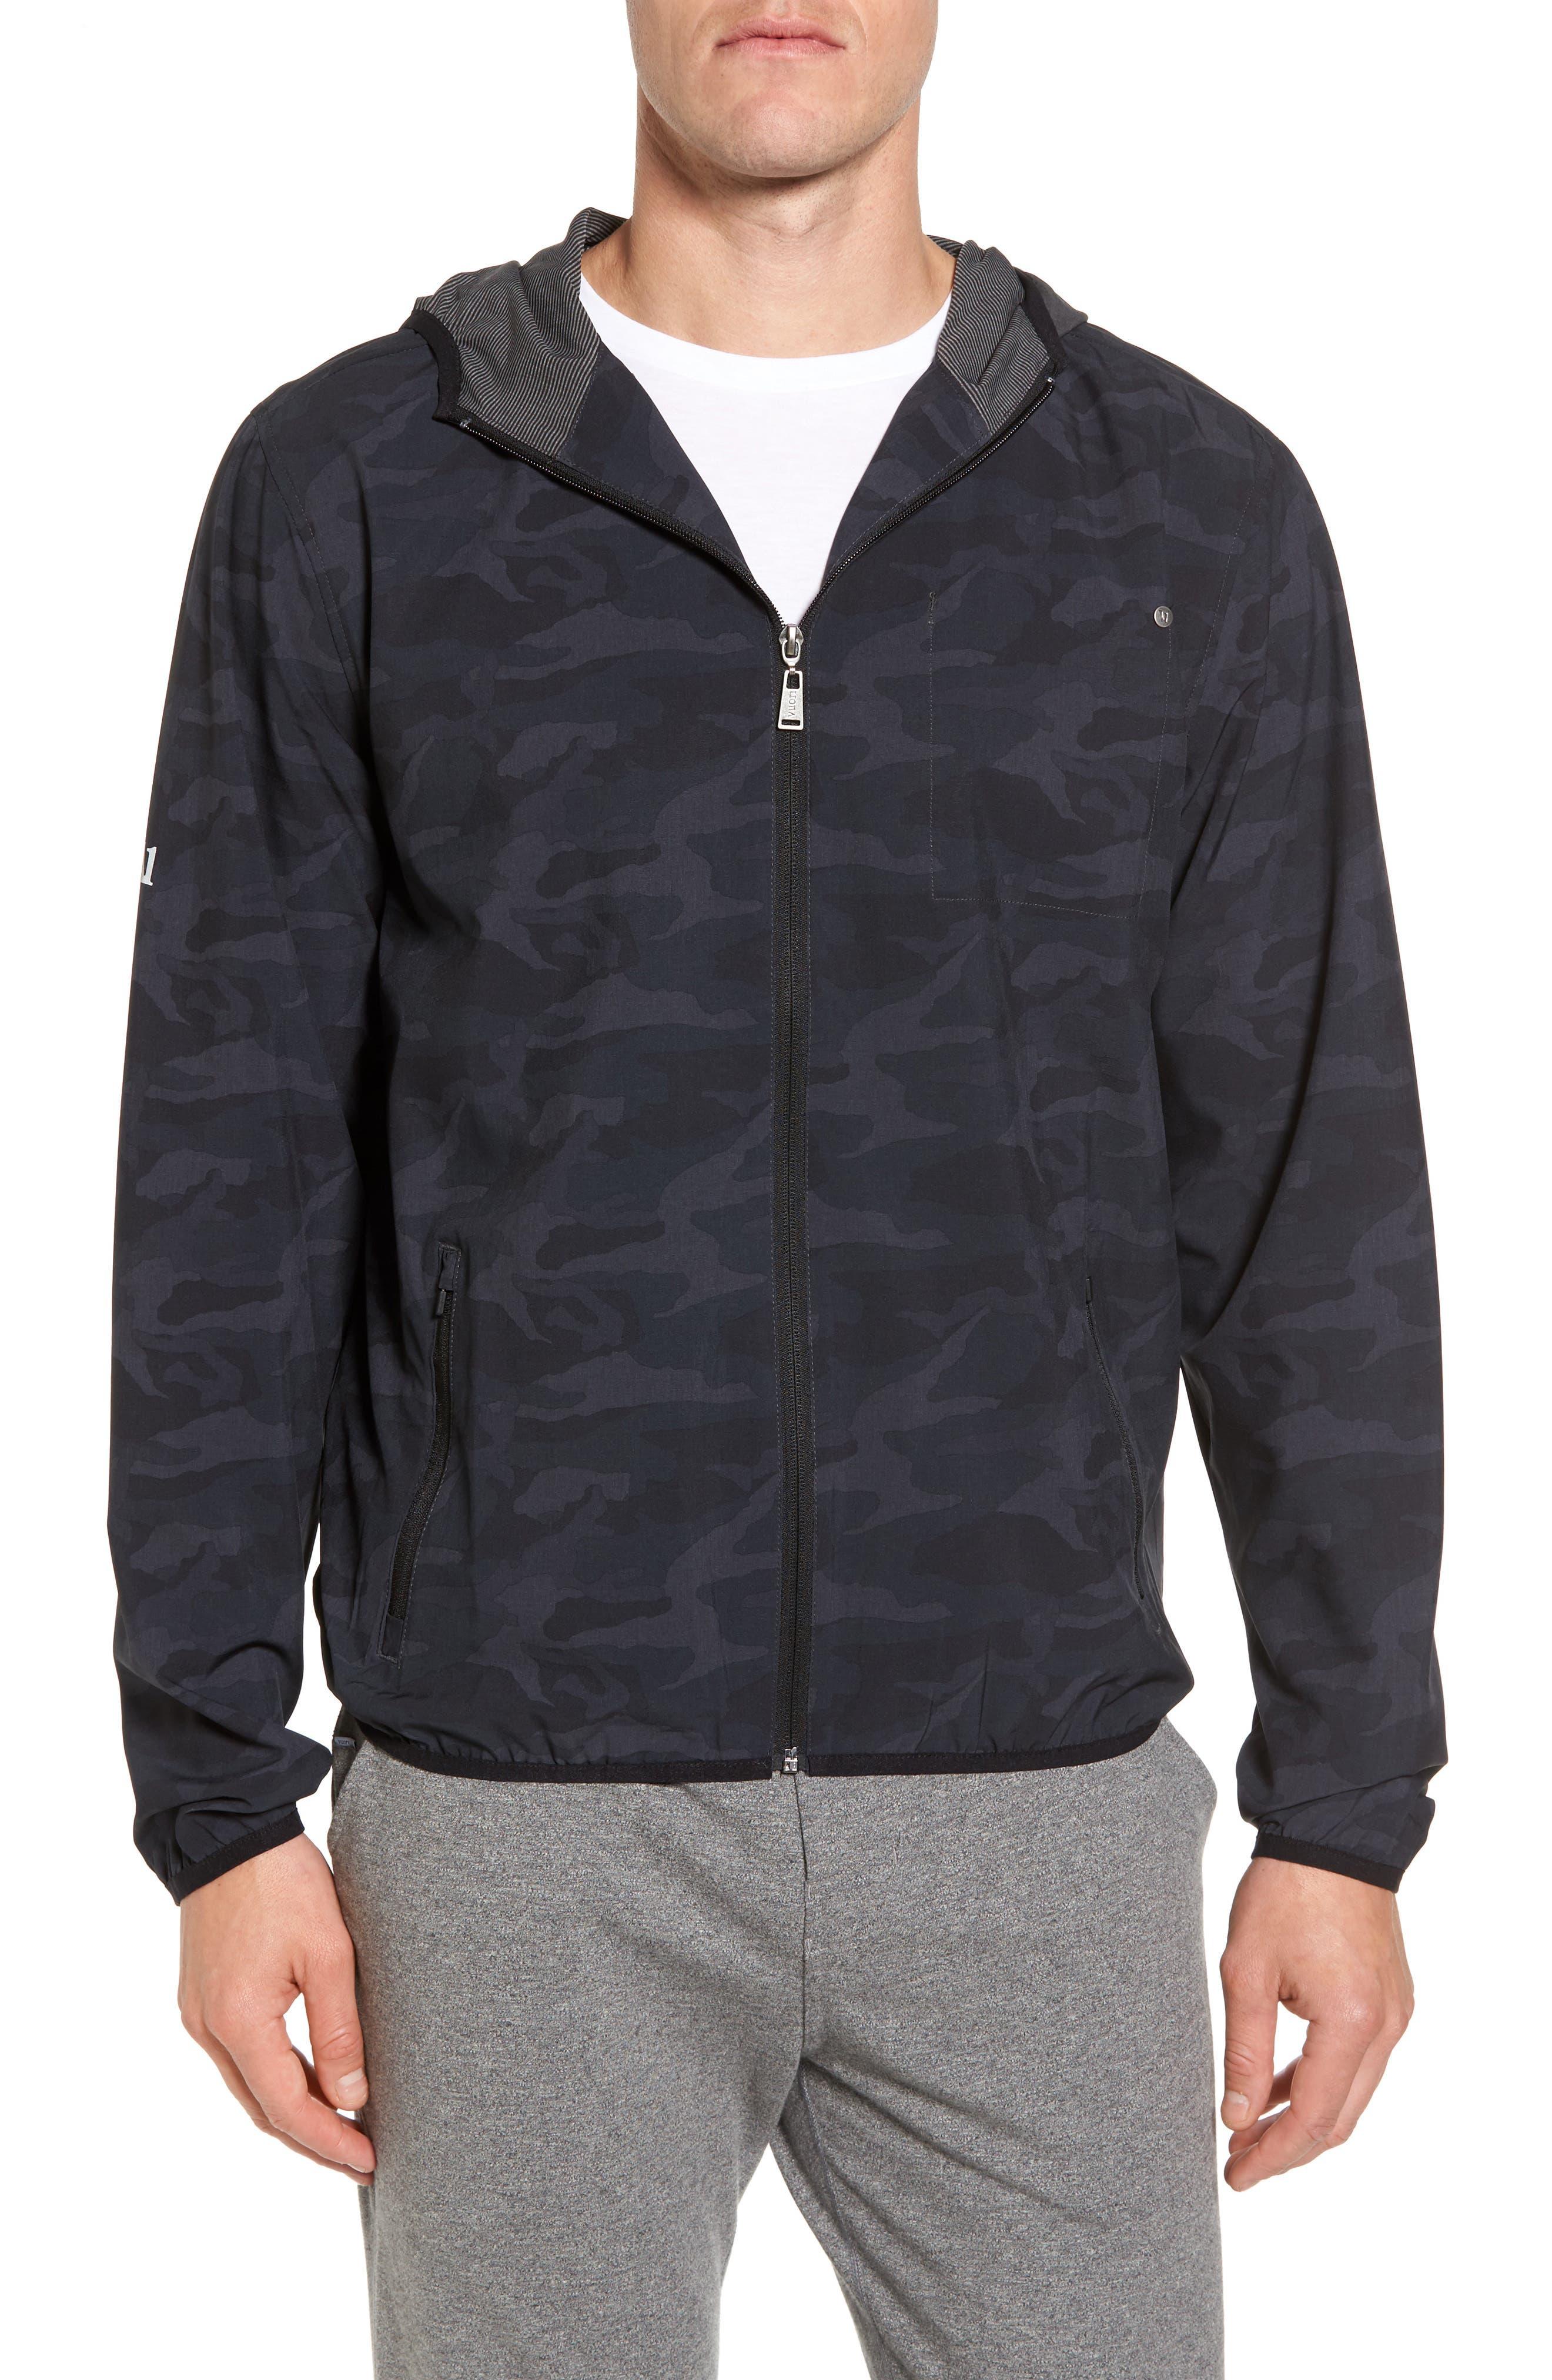 Outdoor Training Shell Jacket,                         Main,                         color, Black Camo